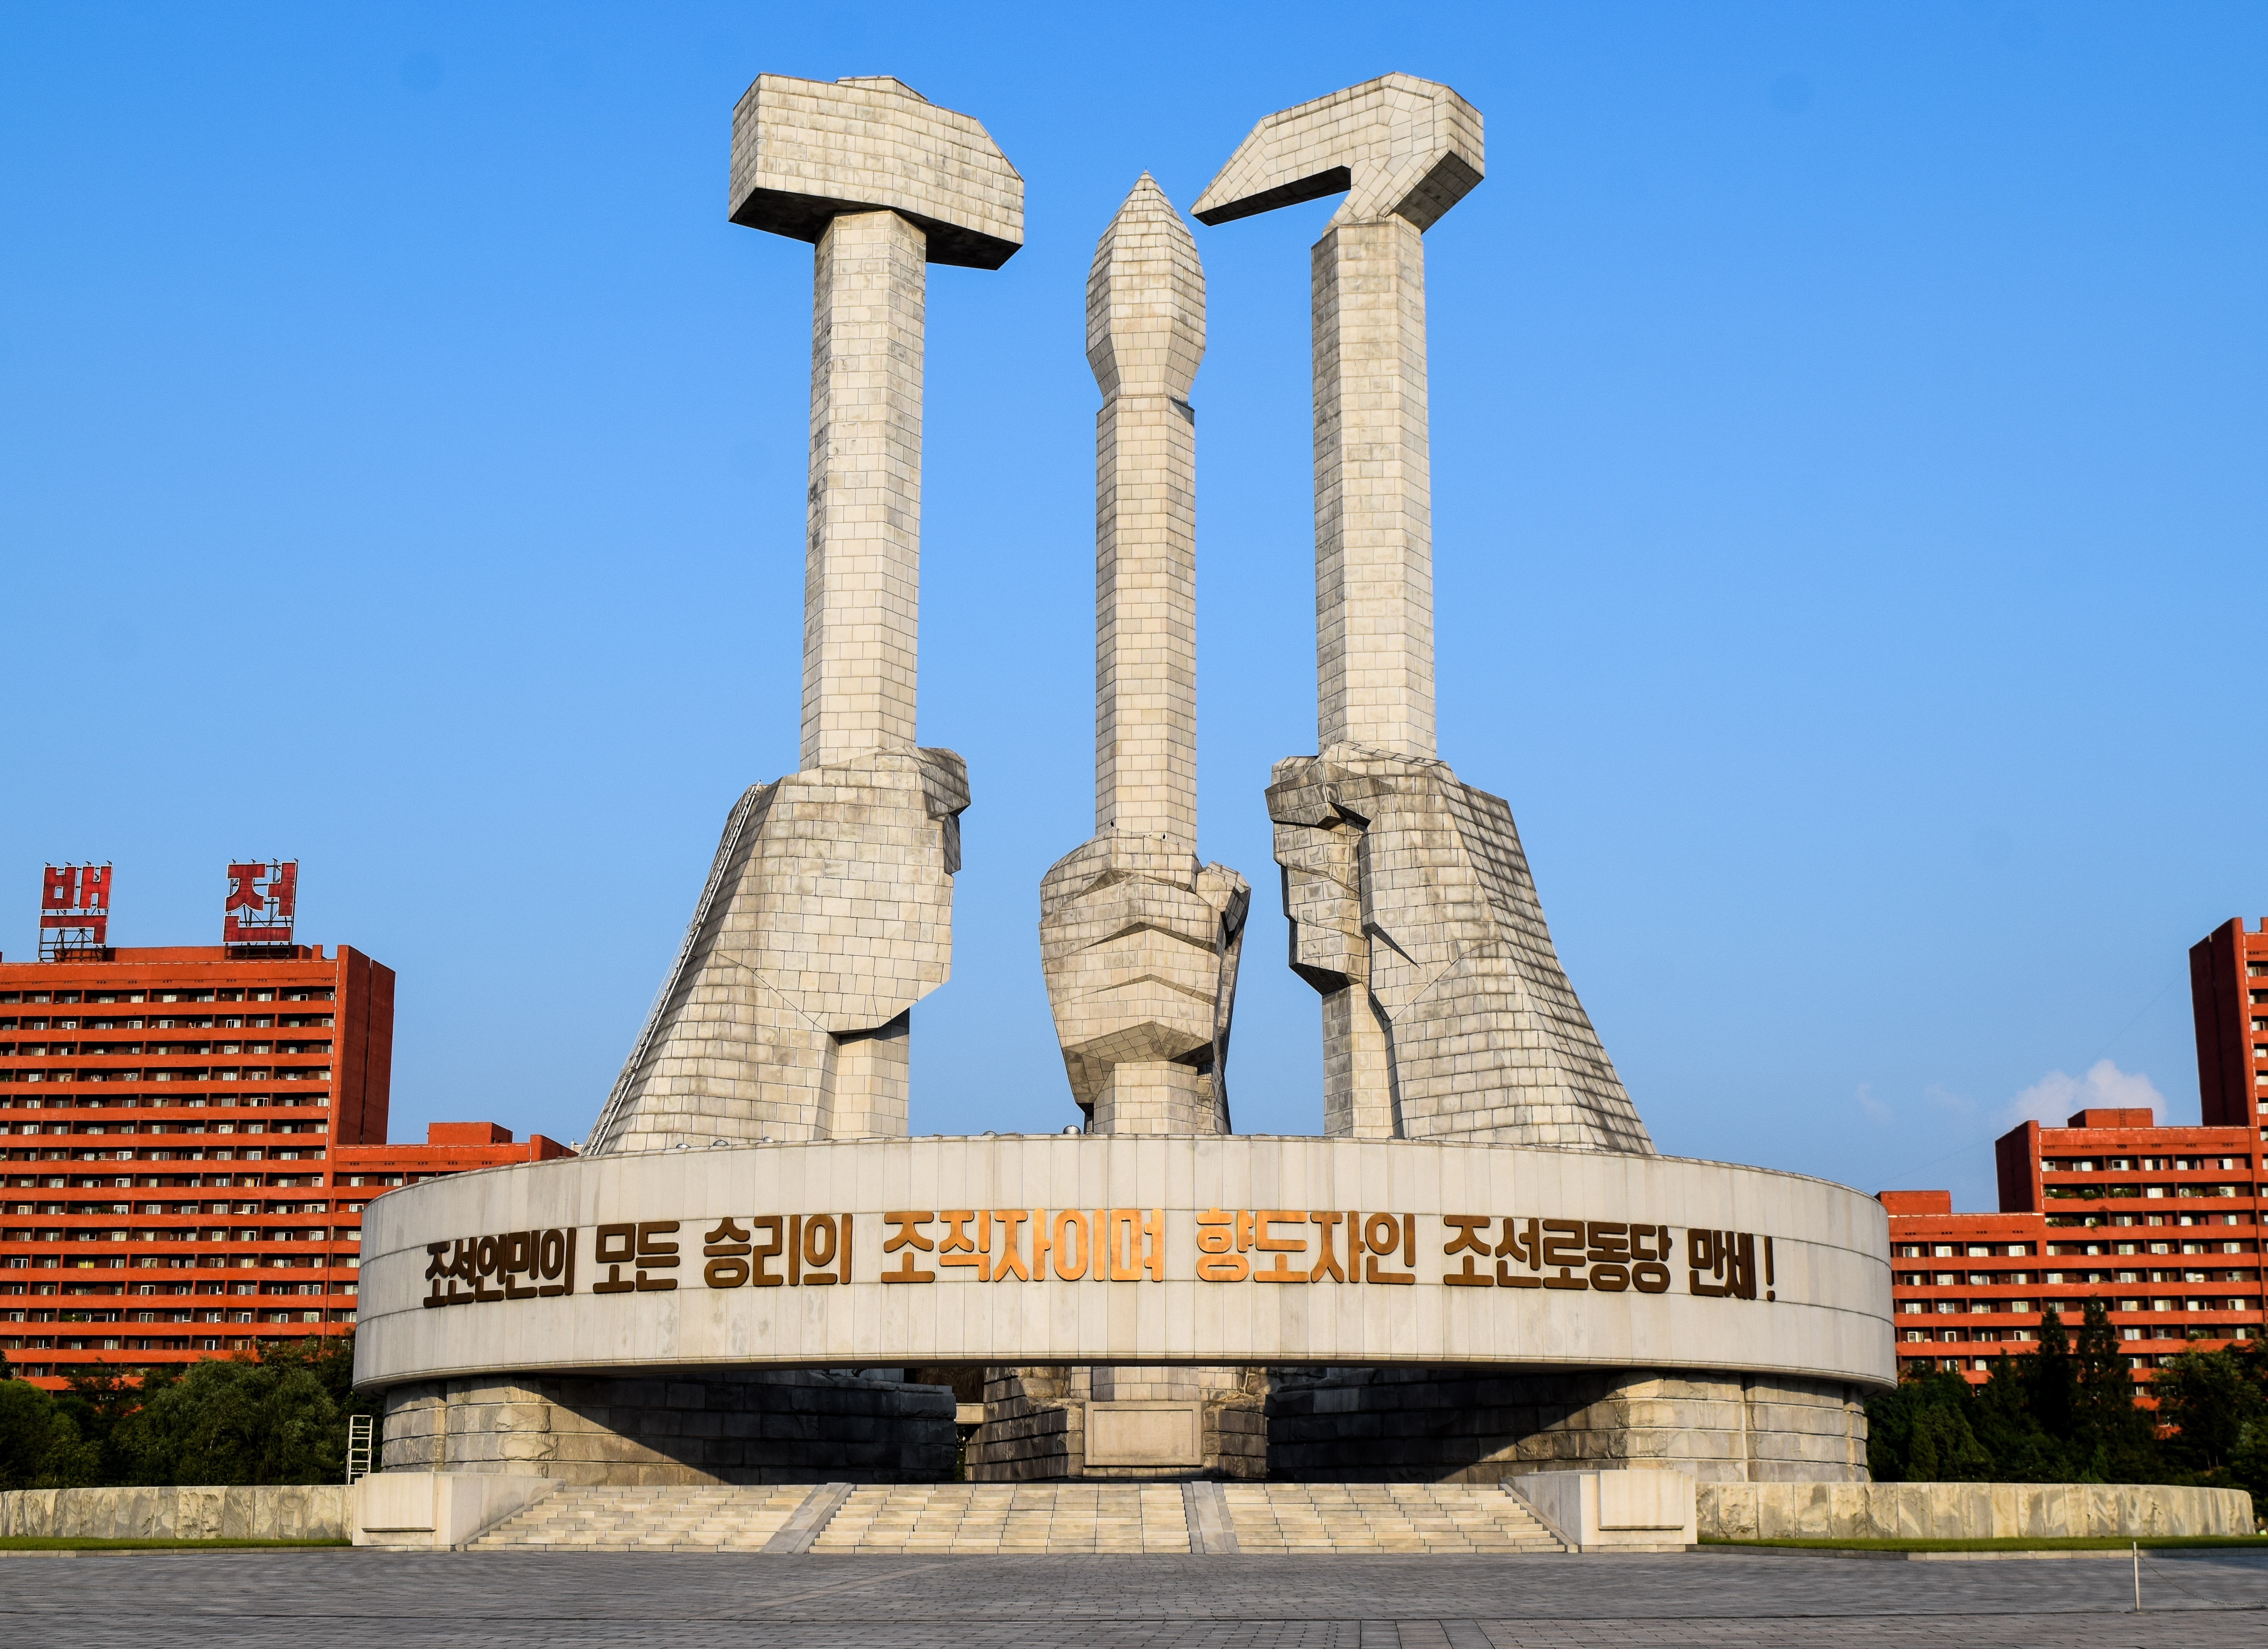 Biden administration may bring North Korean policy changes